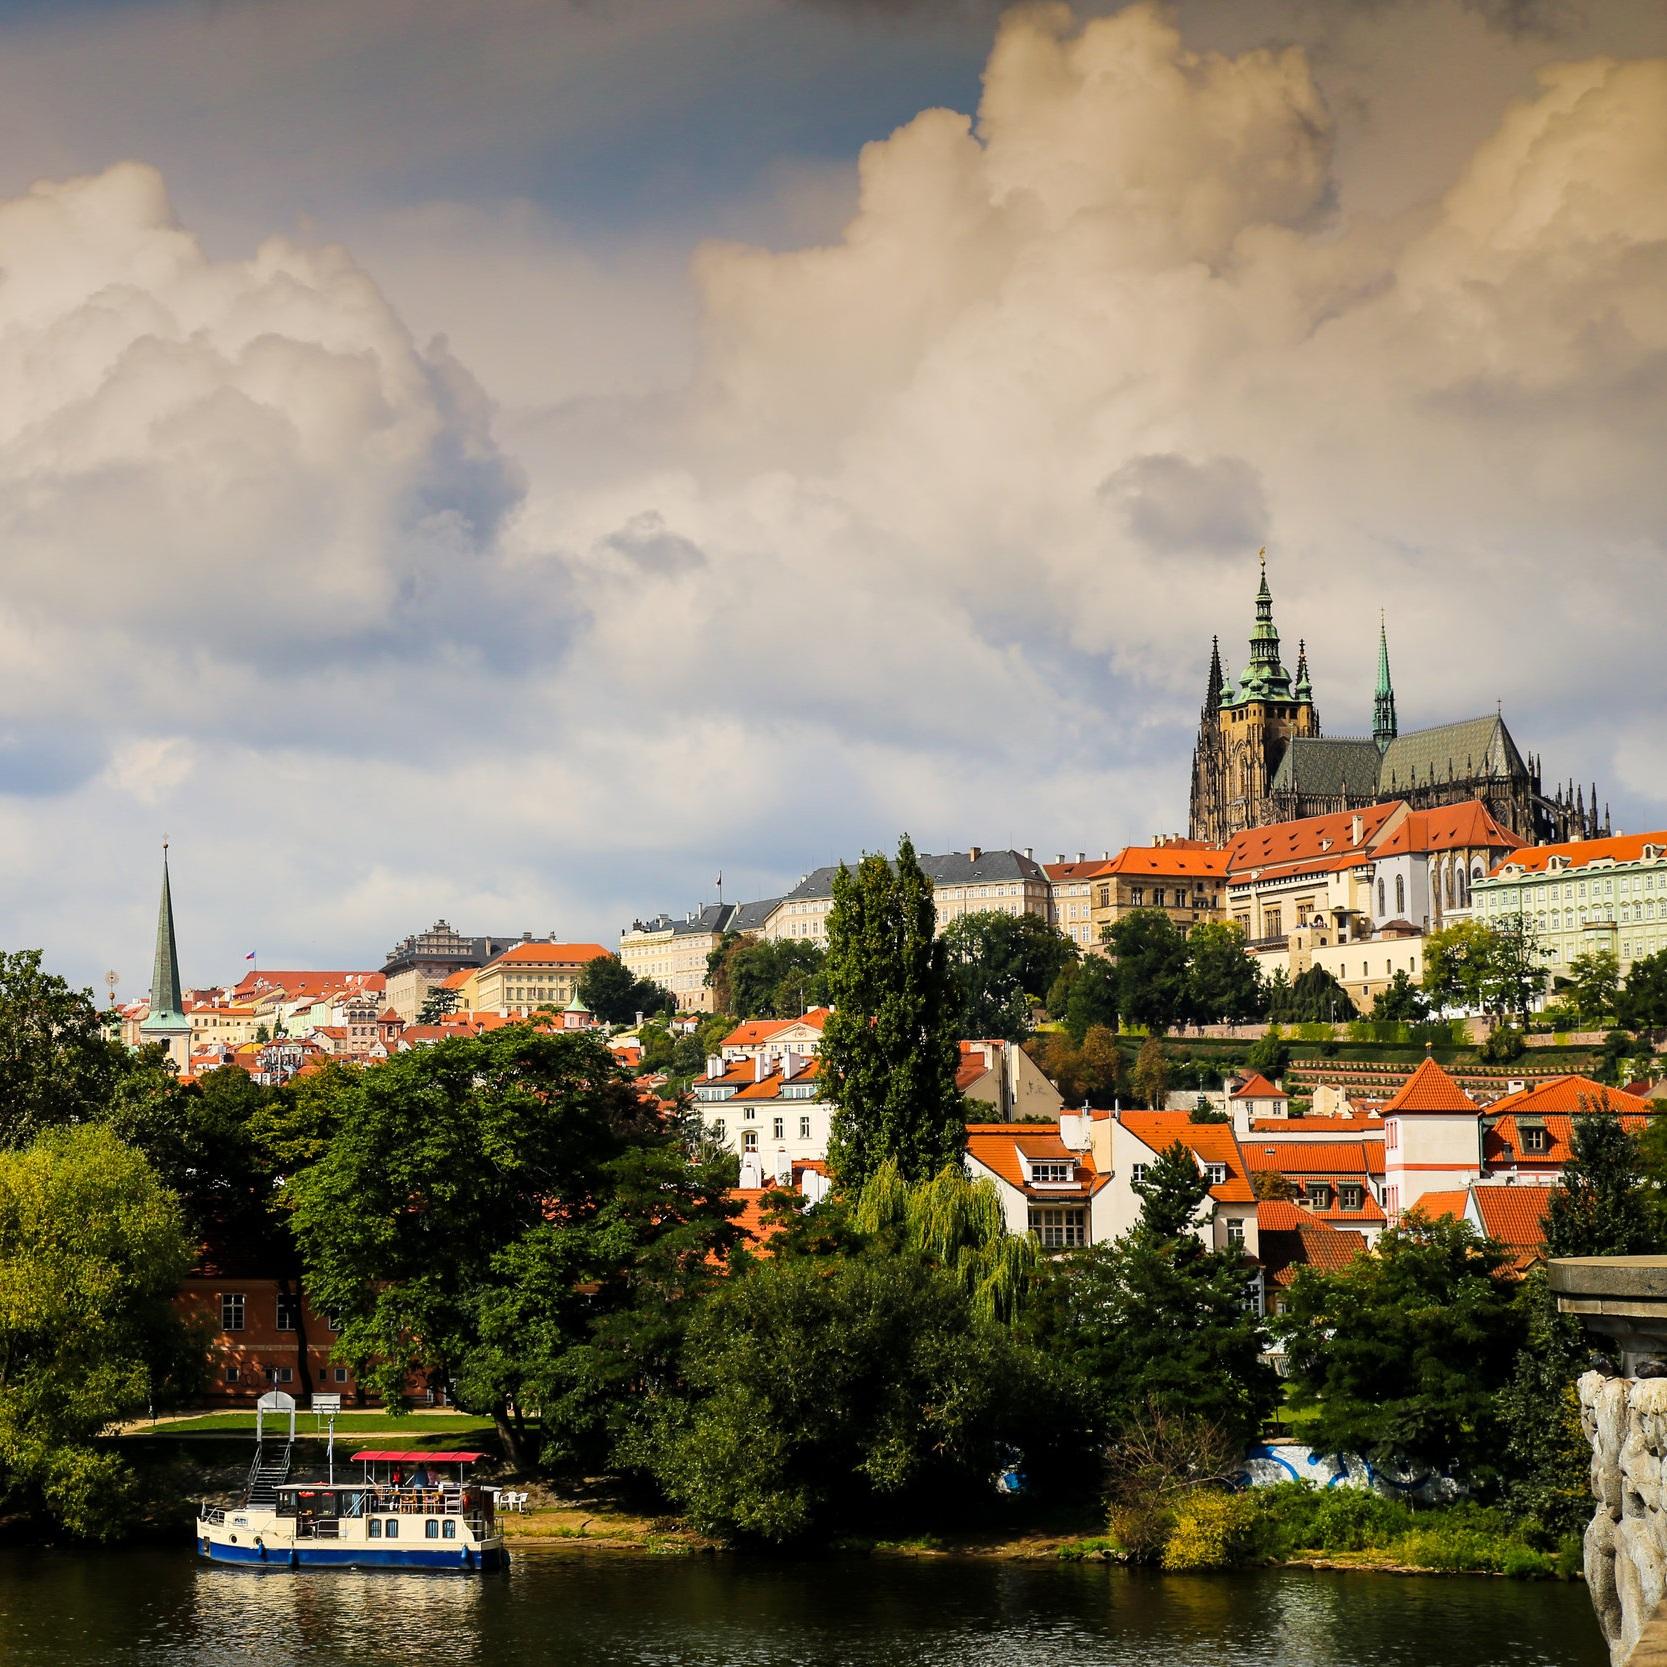 Prague castle and river view